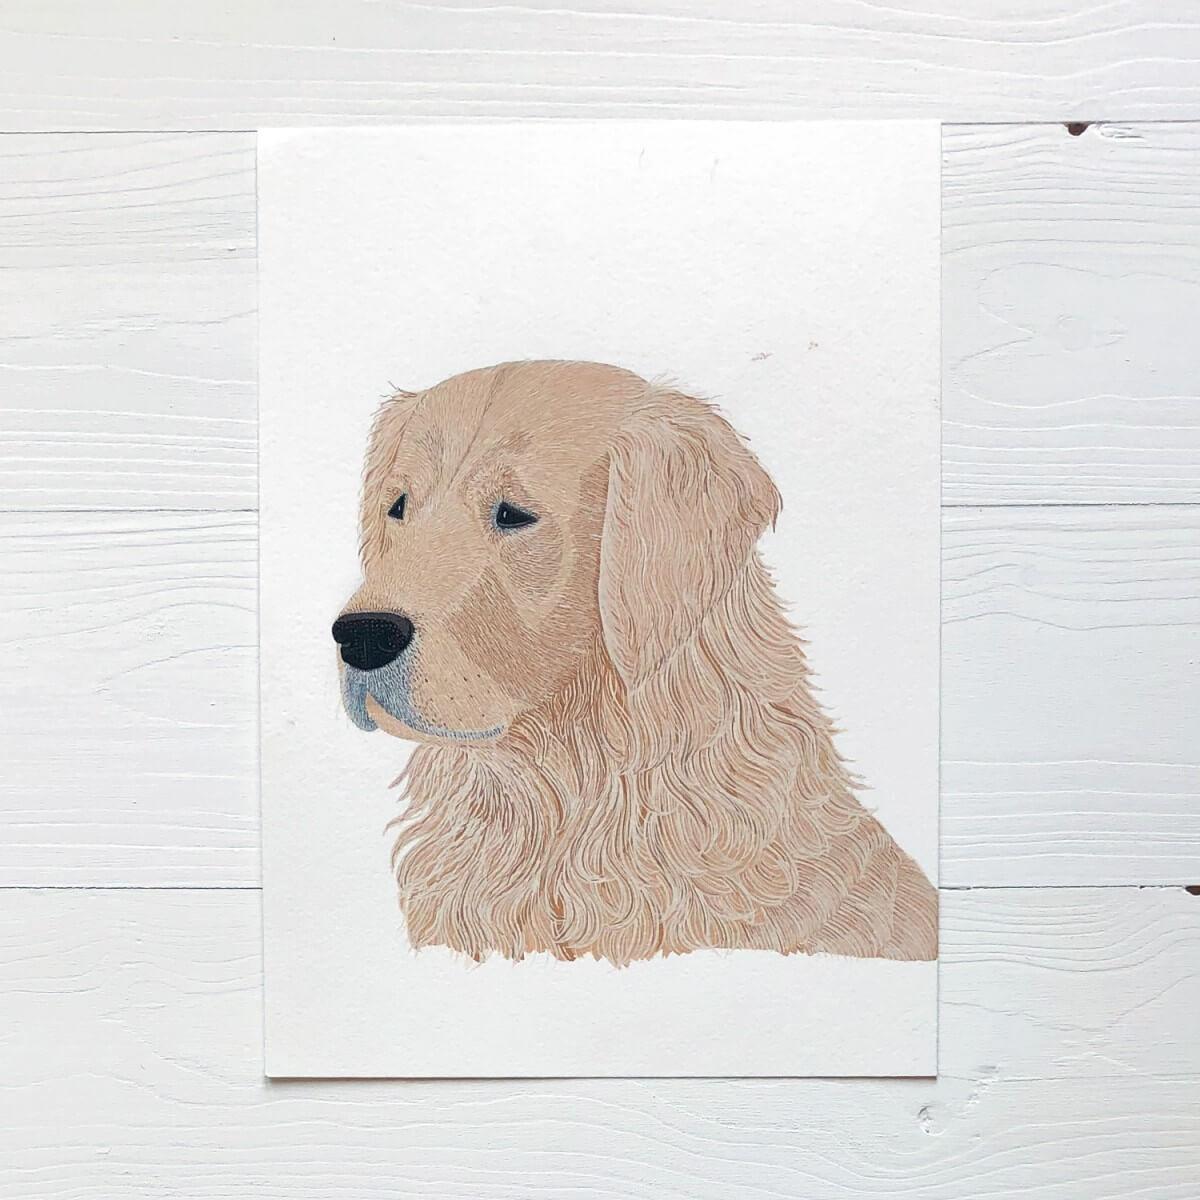 Golden Retriever Dog Original Gouache Painting By Bird